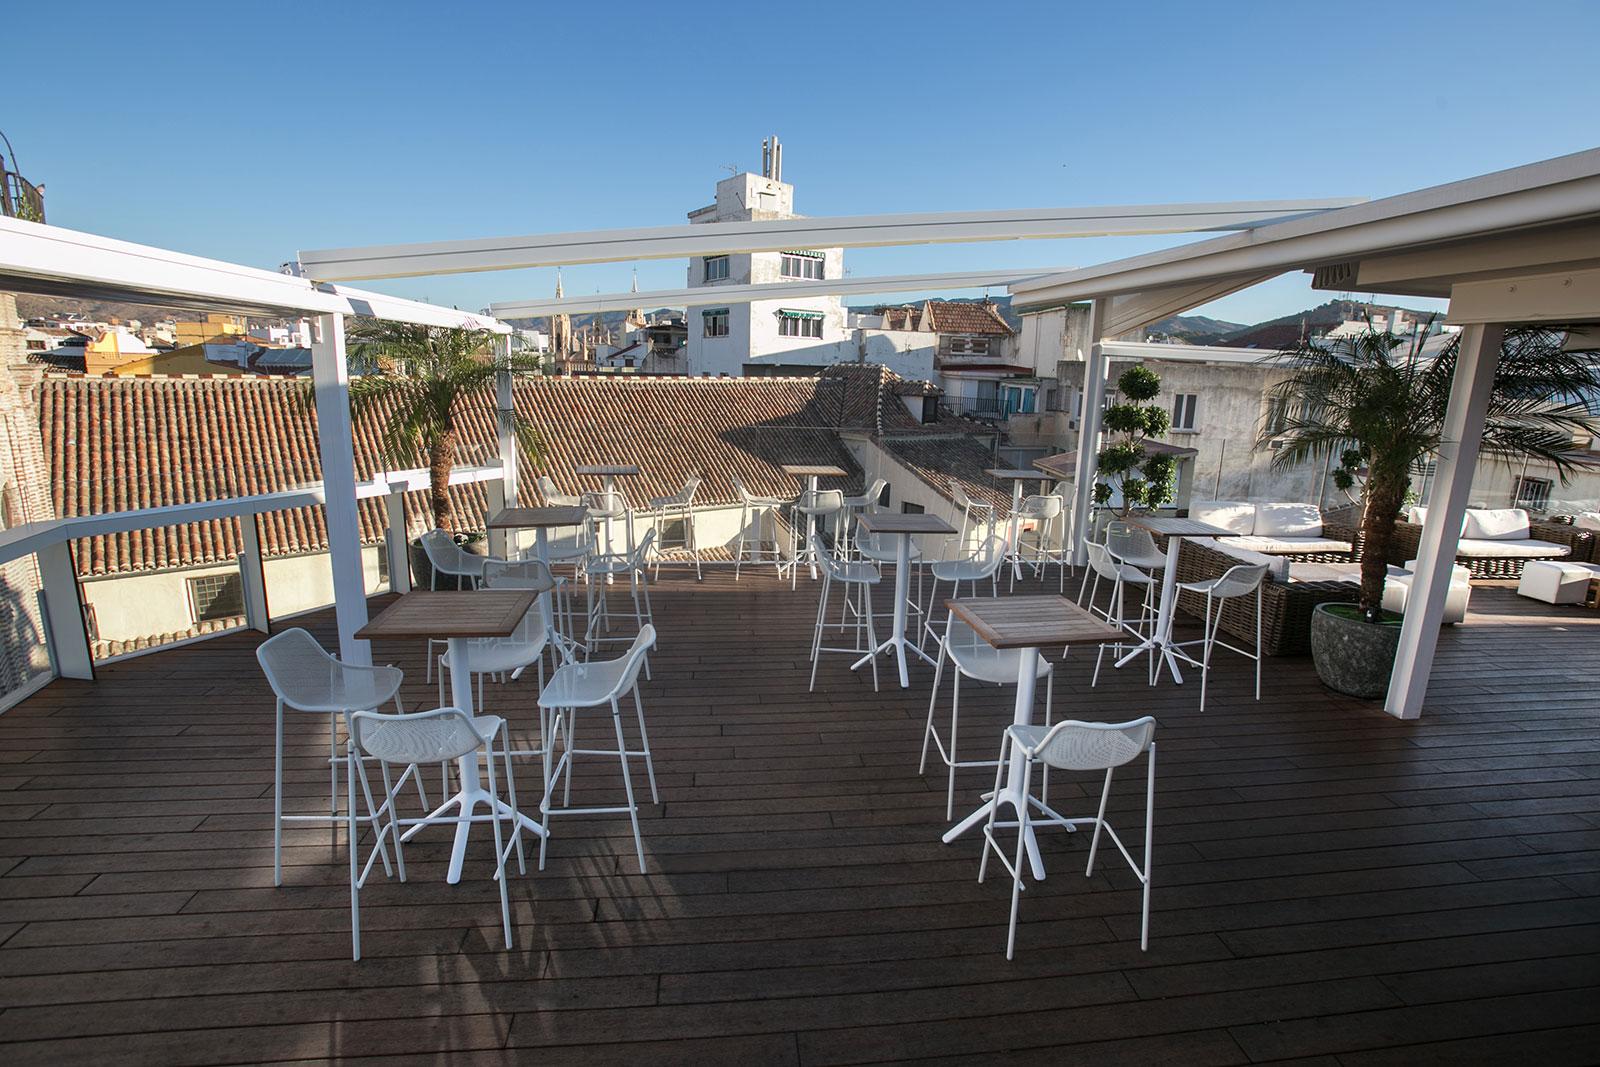 Mph Galeria Terraza Sanjuan 02 Hotel Málaga Premium